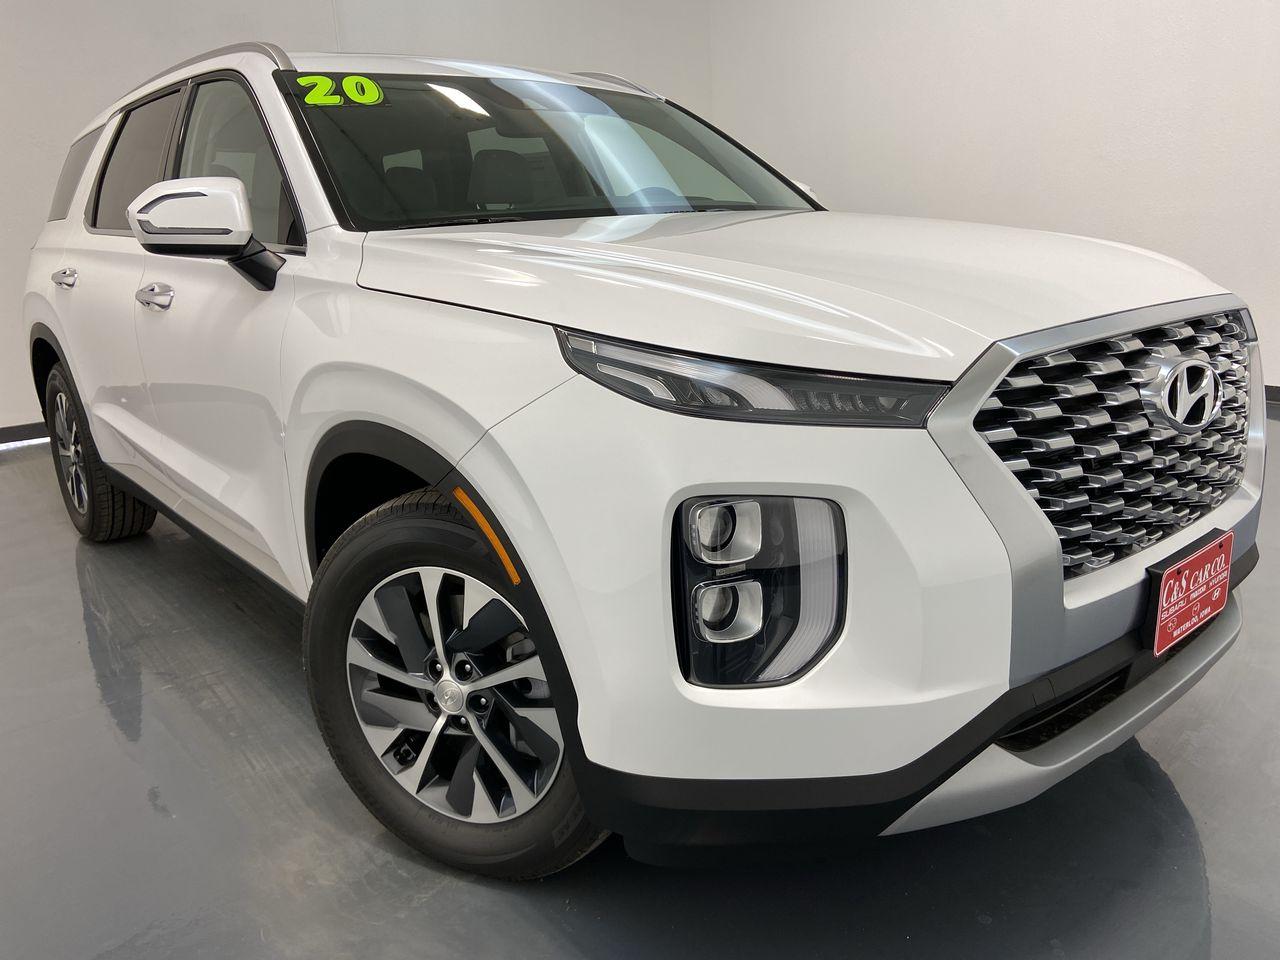 2020 Hyundai PALISADE 4D SUV AWD  - HY8428  - C & S Car Company